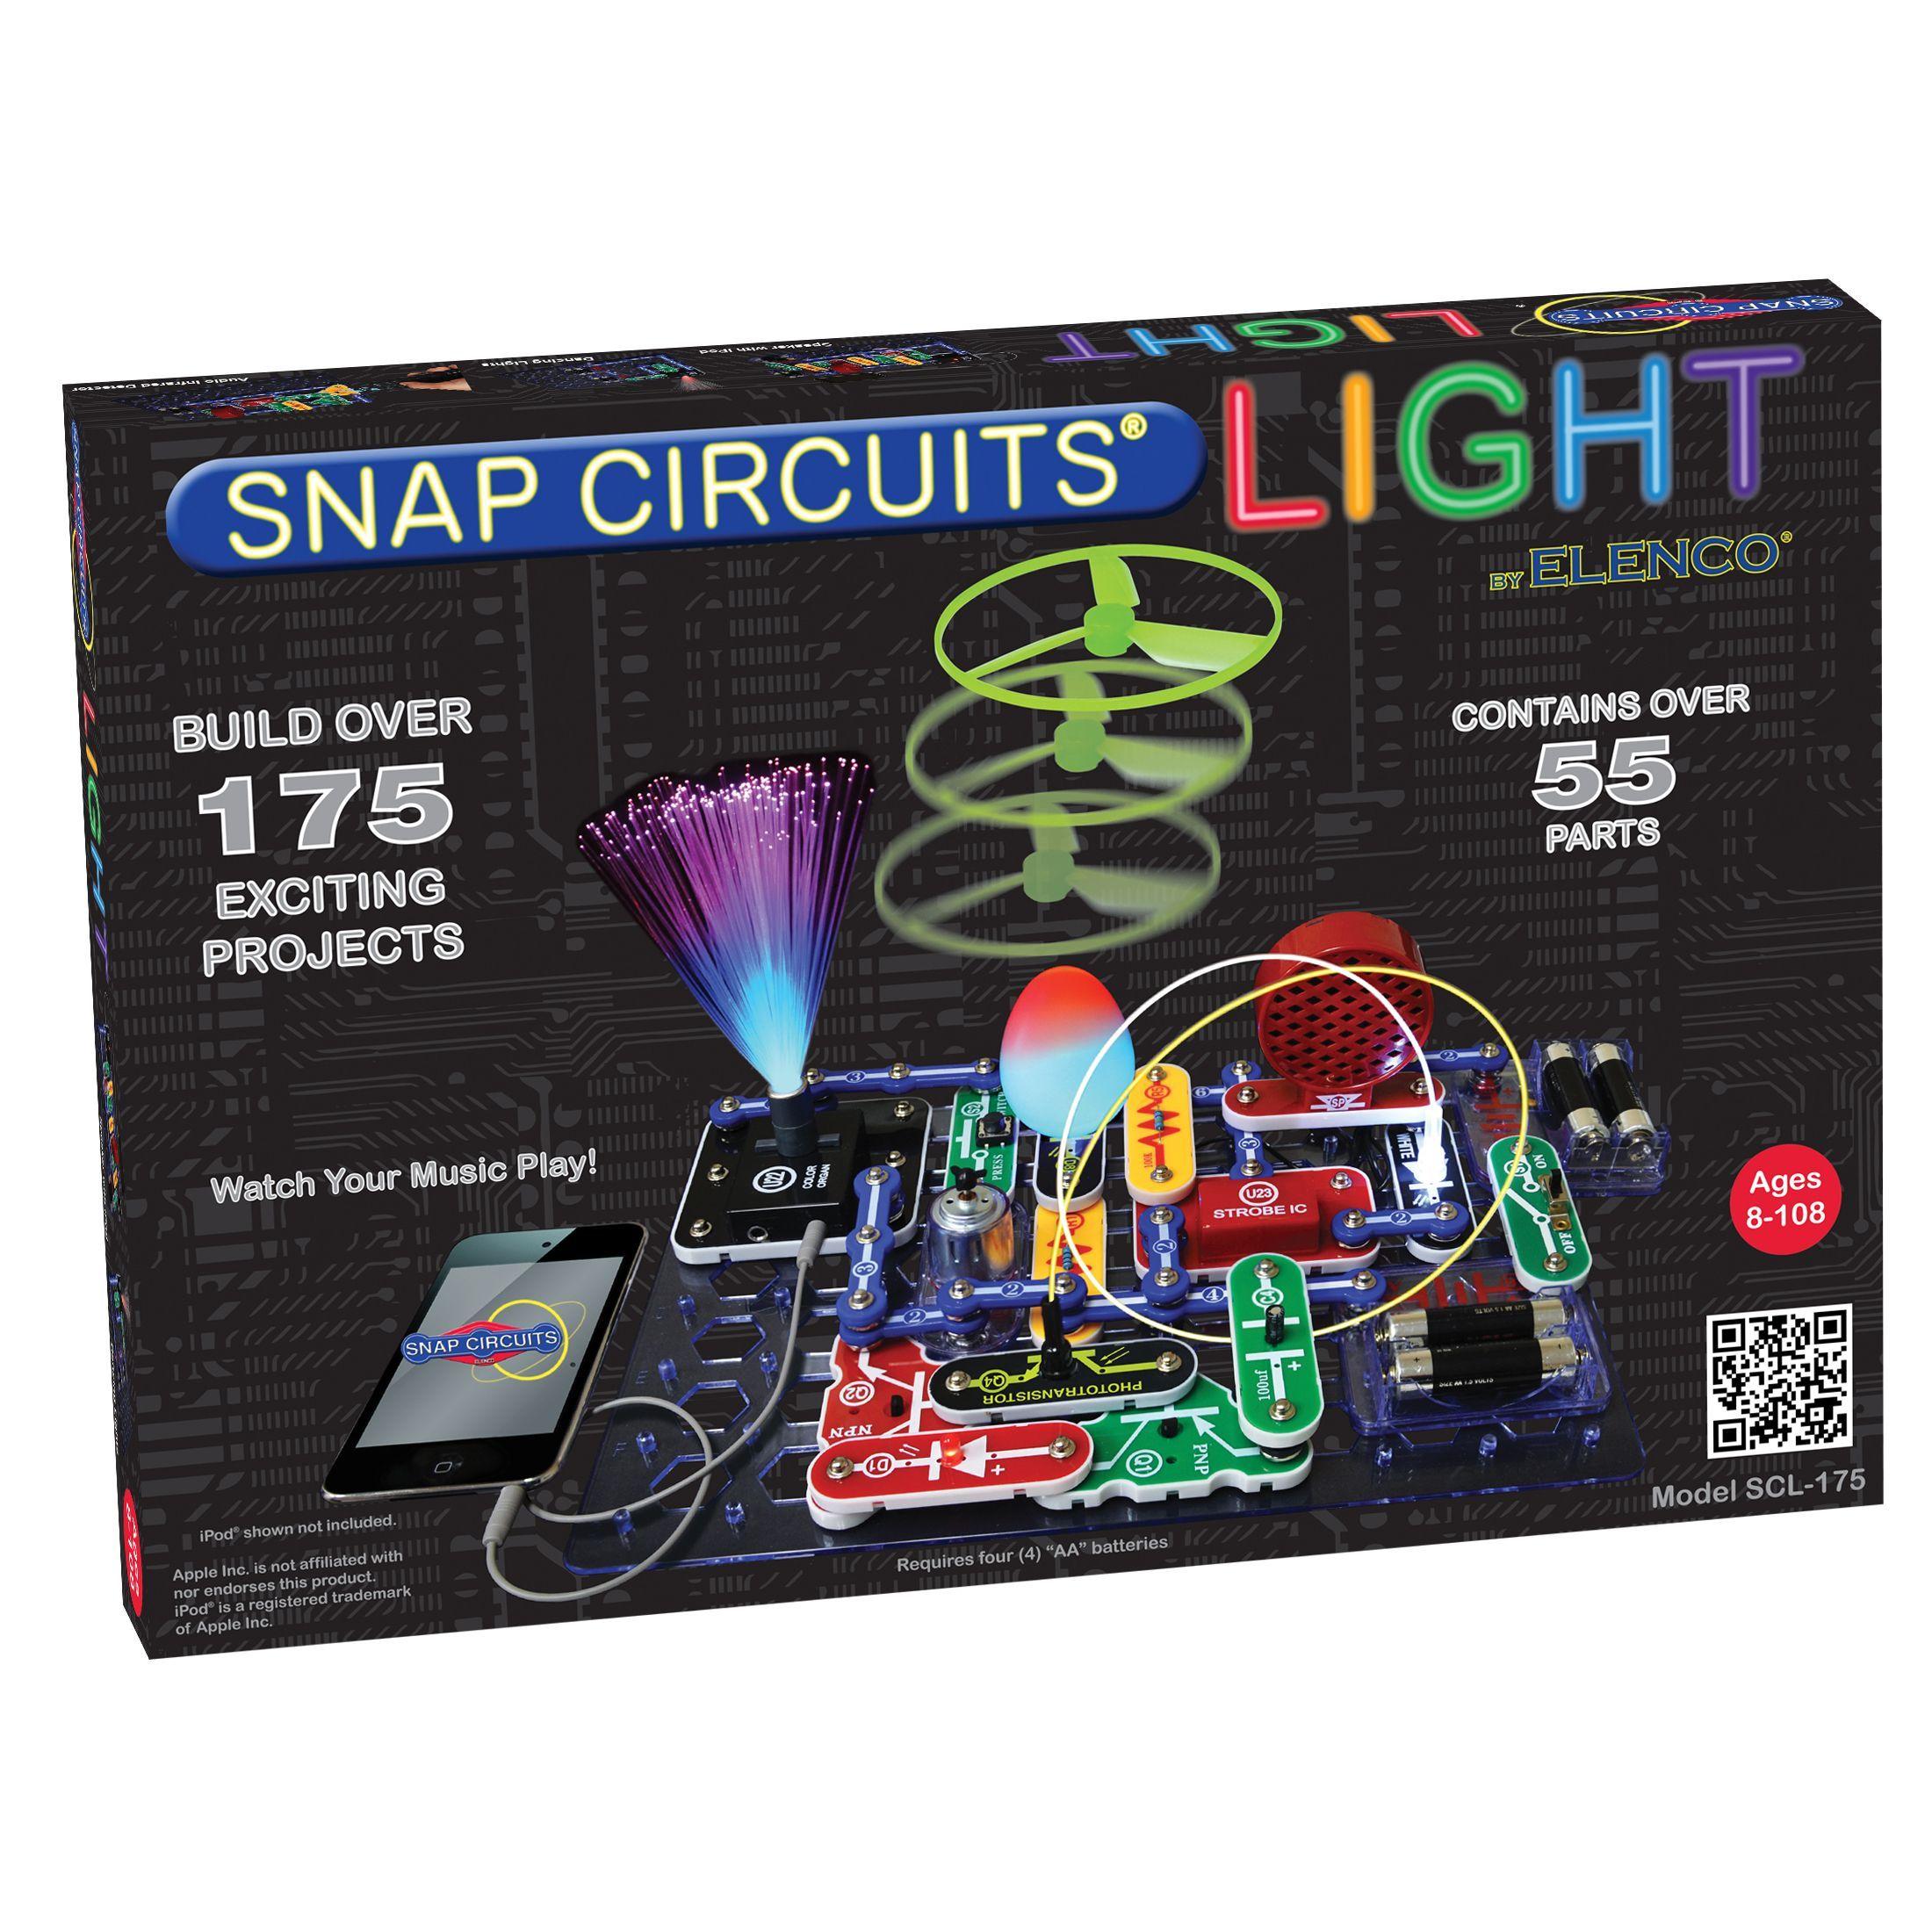 Elenco Electronics Snap Circuits Light | Products | Pinterest | Snap ...